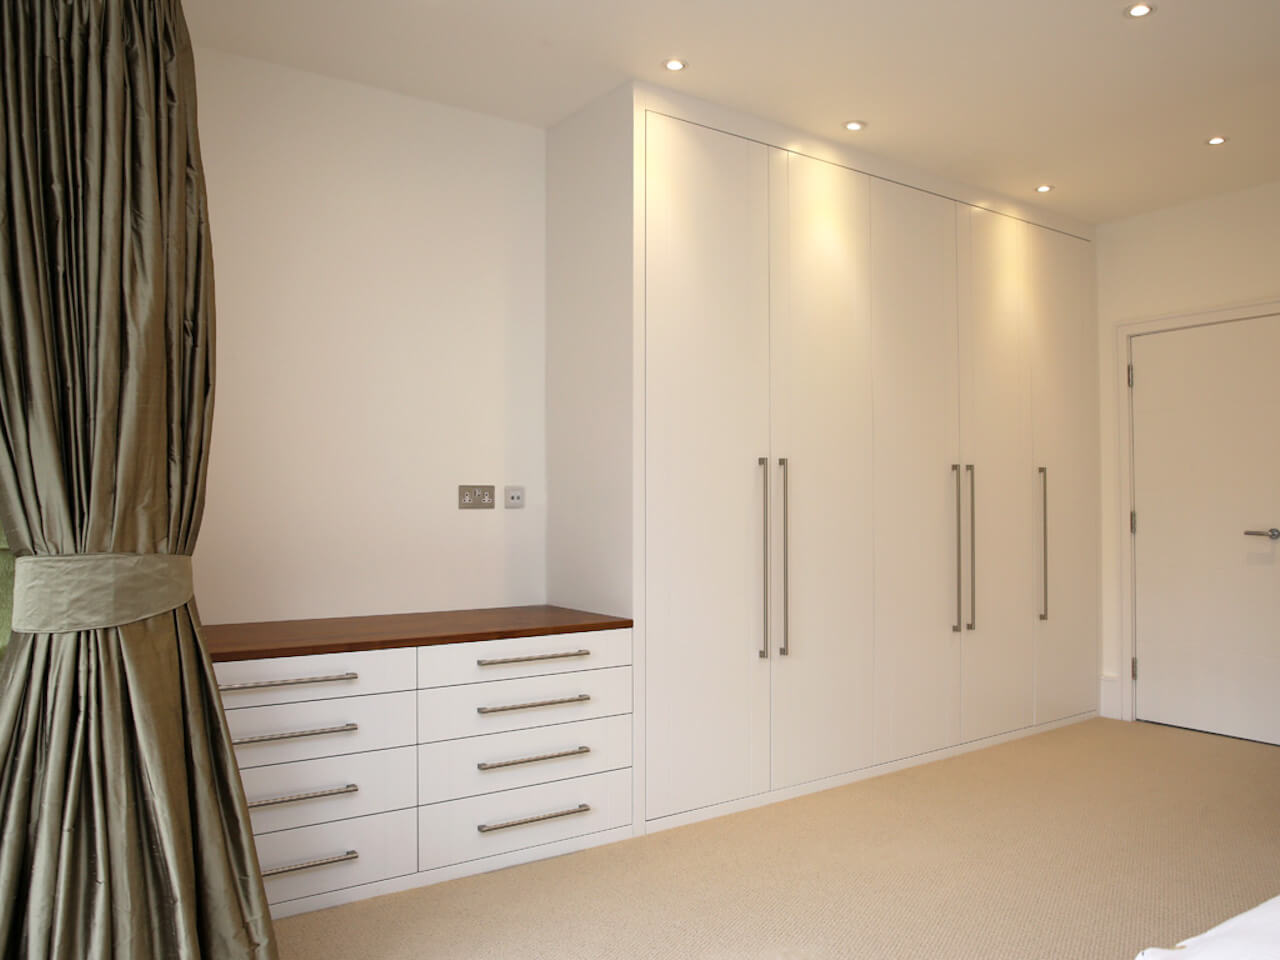 1-bespoke-built-in-fitted-wardrobe-white-chest-drawers-Modern-bedroom-furniture.jpg